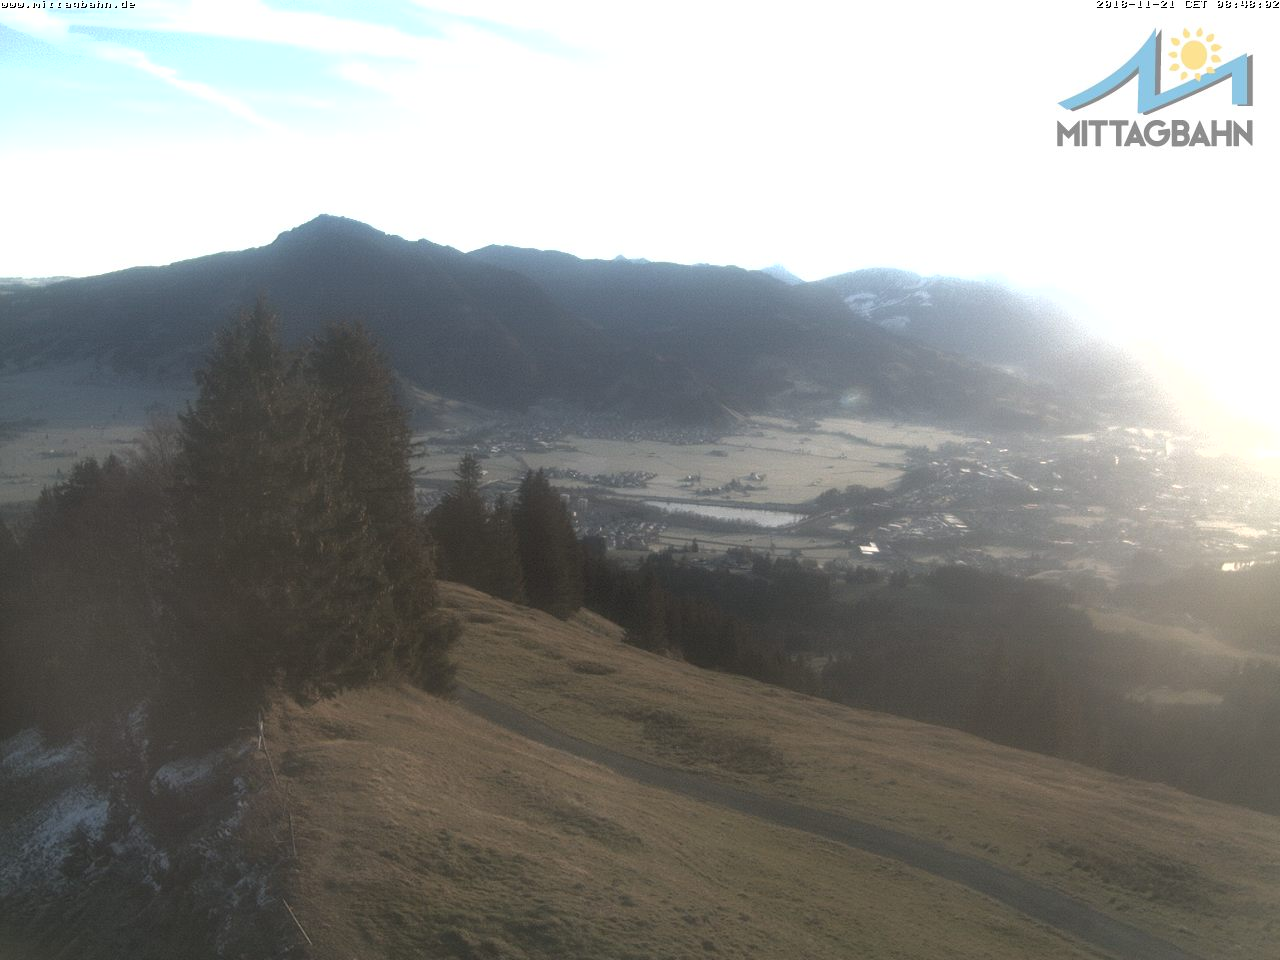 Webcam Ski Resort Immenstadt - Mittag cam 7 - Bavaria Alps - Allg�u